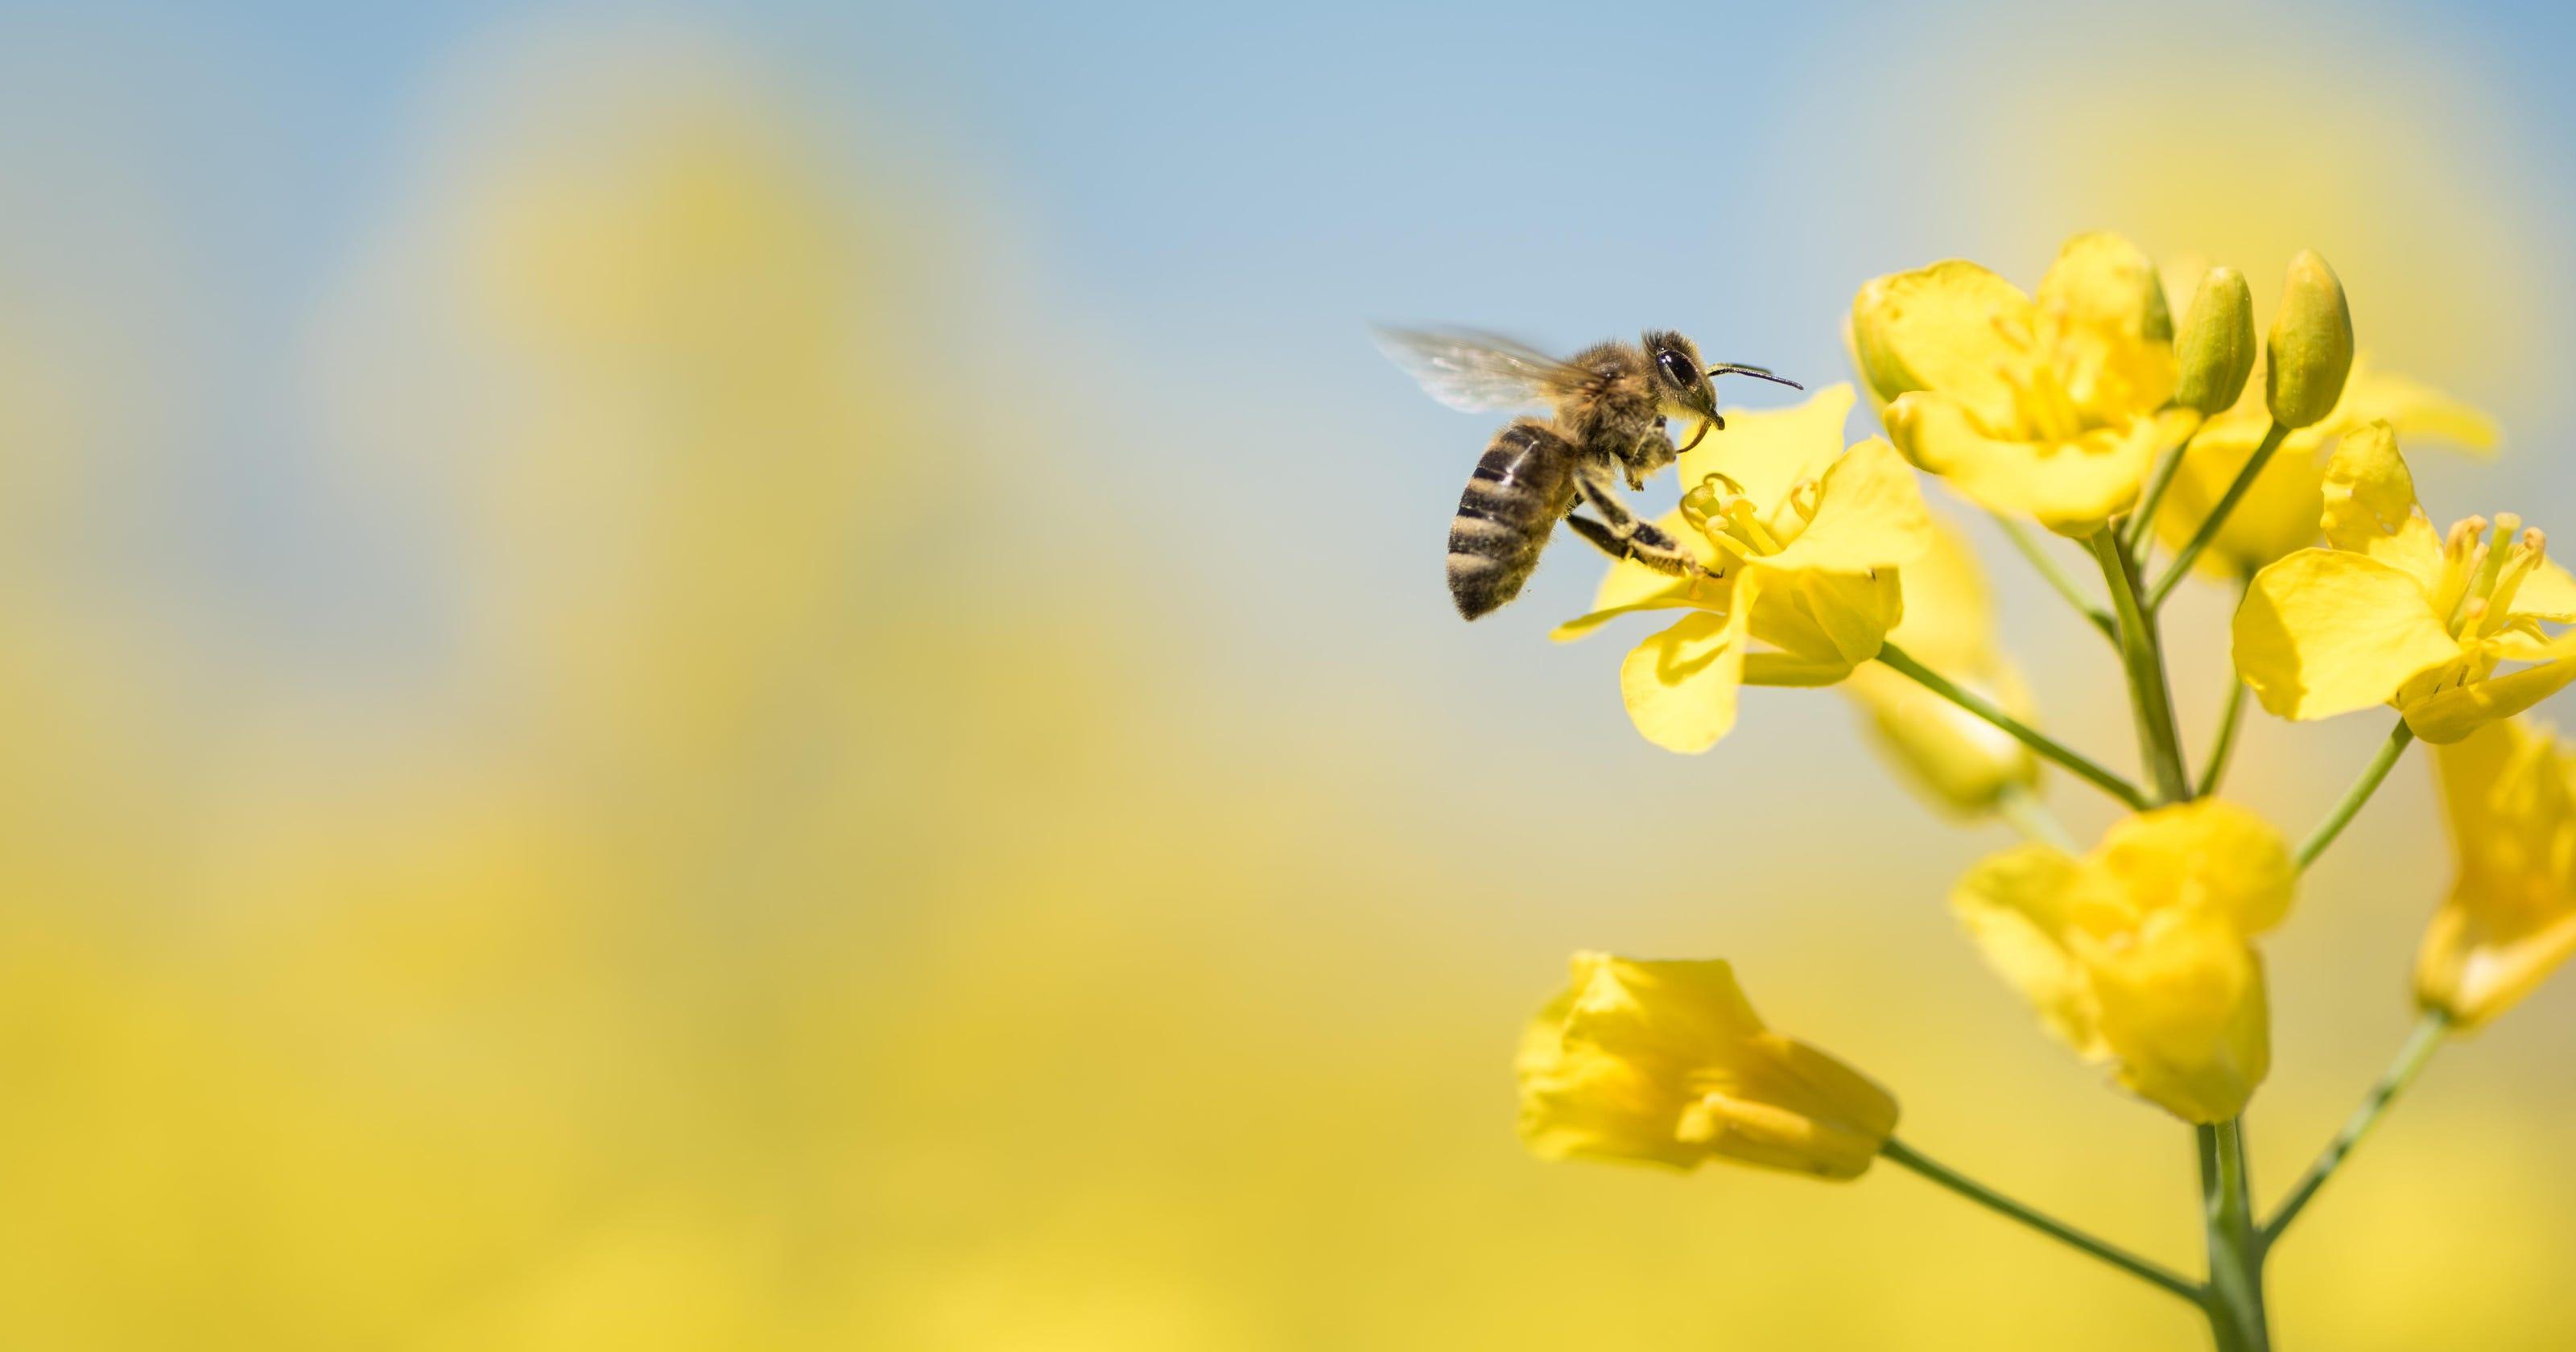 Legislators look to sweeten up Iowa's list of symbols by naming honeybee as state insect